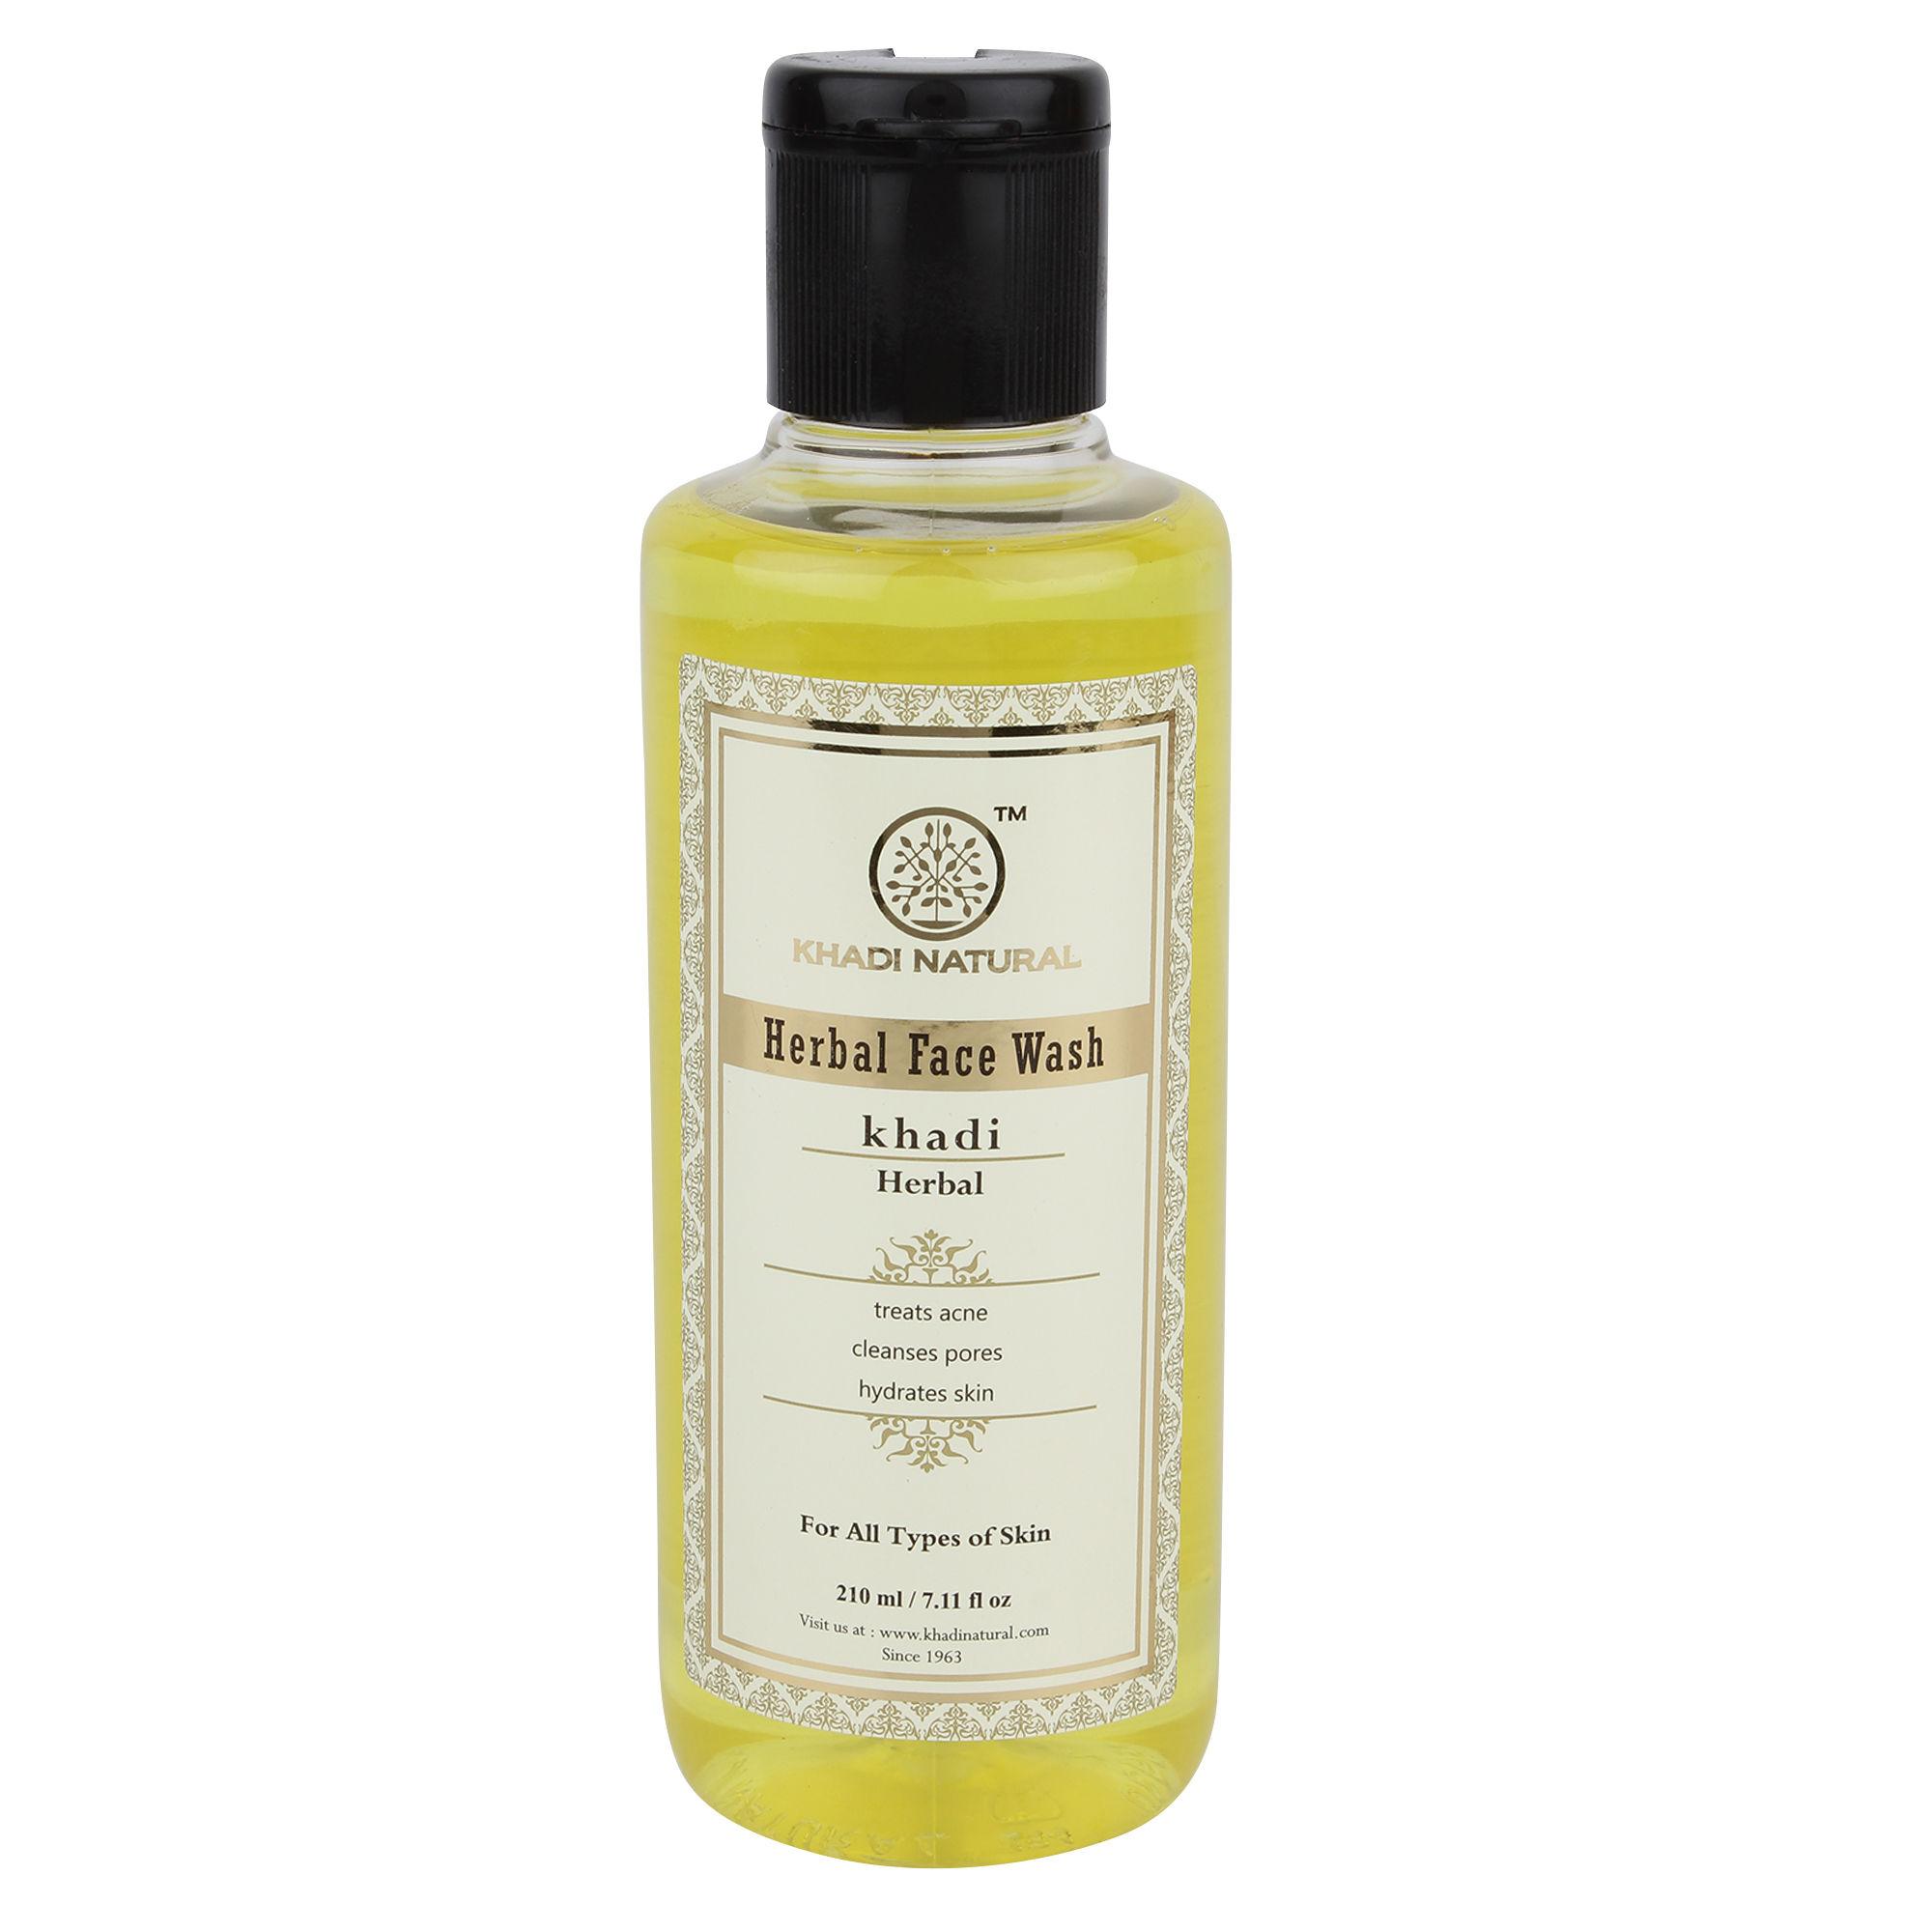 Khadi Natural Herbal Face Wash